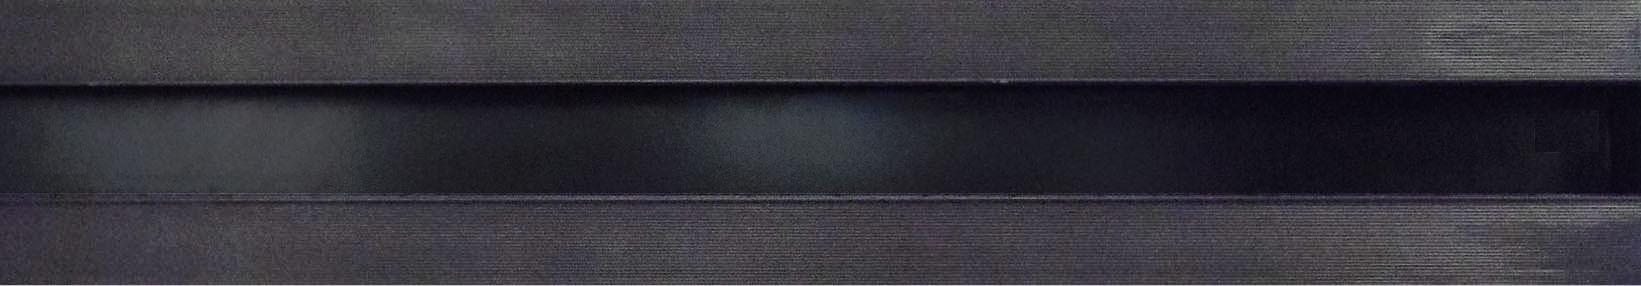 Hidden large volume slot diffuser for high ceiling